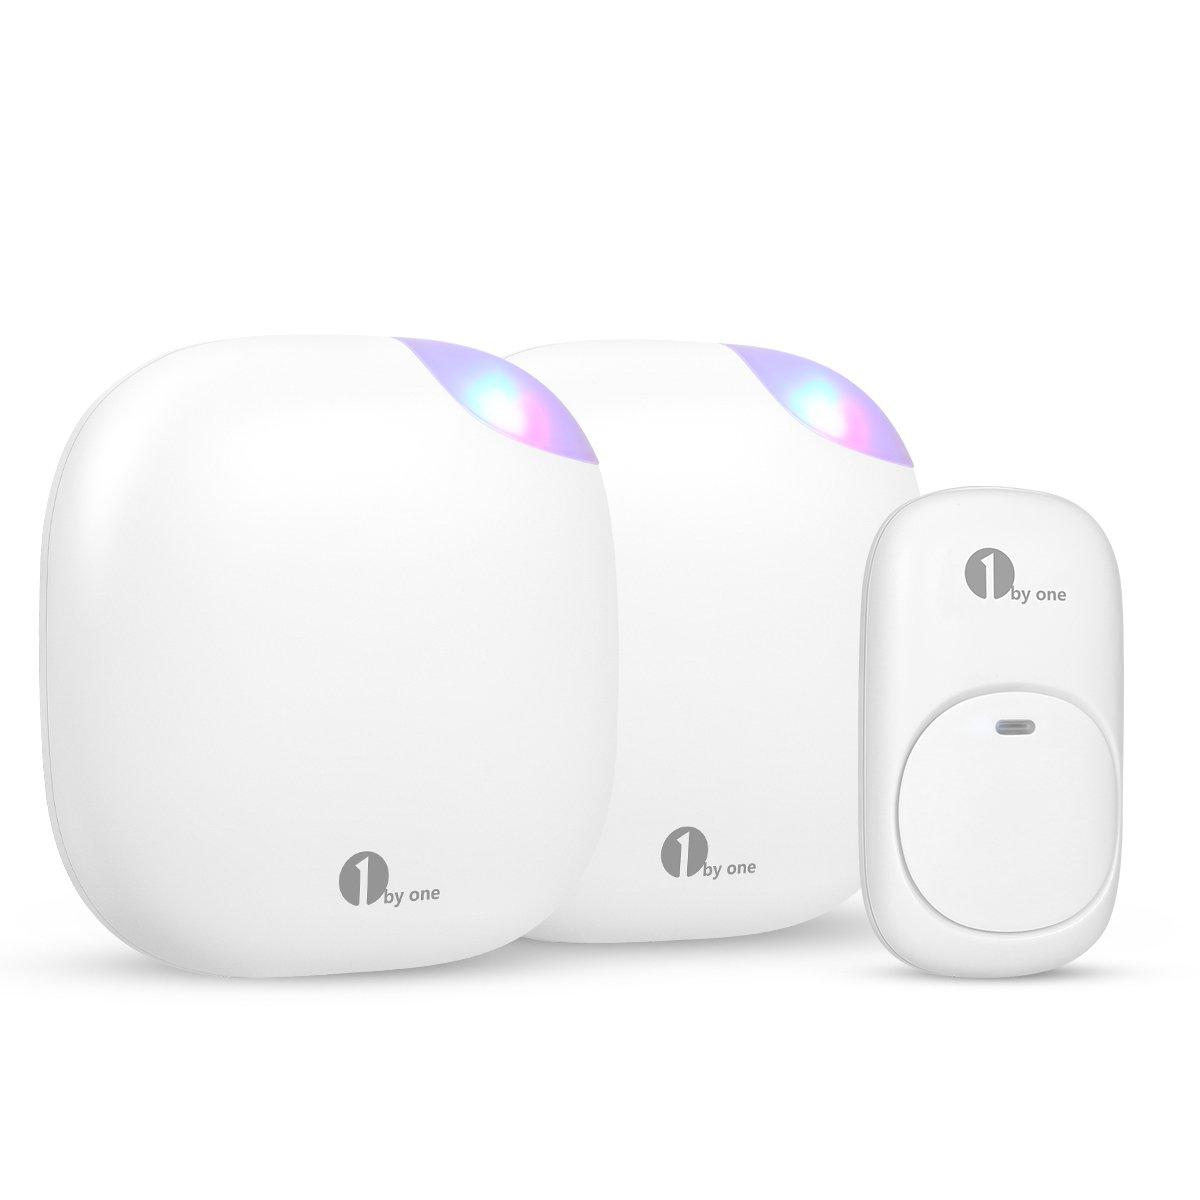 1byone O00QH-0761-VC Wireless Doorbell, White